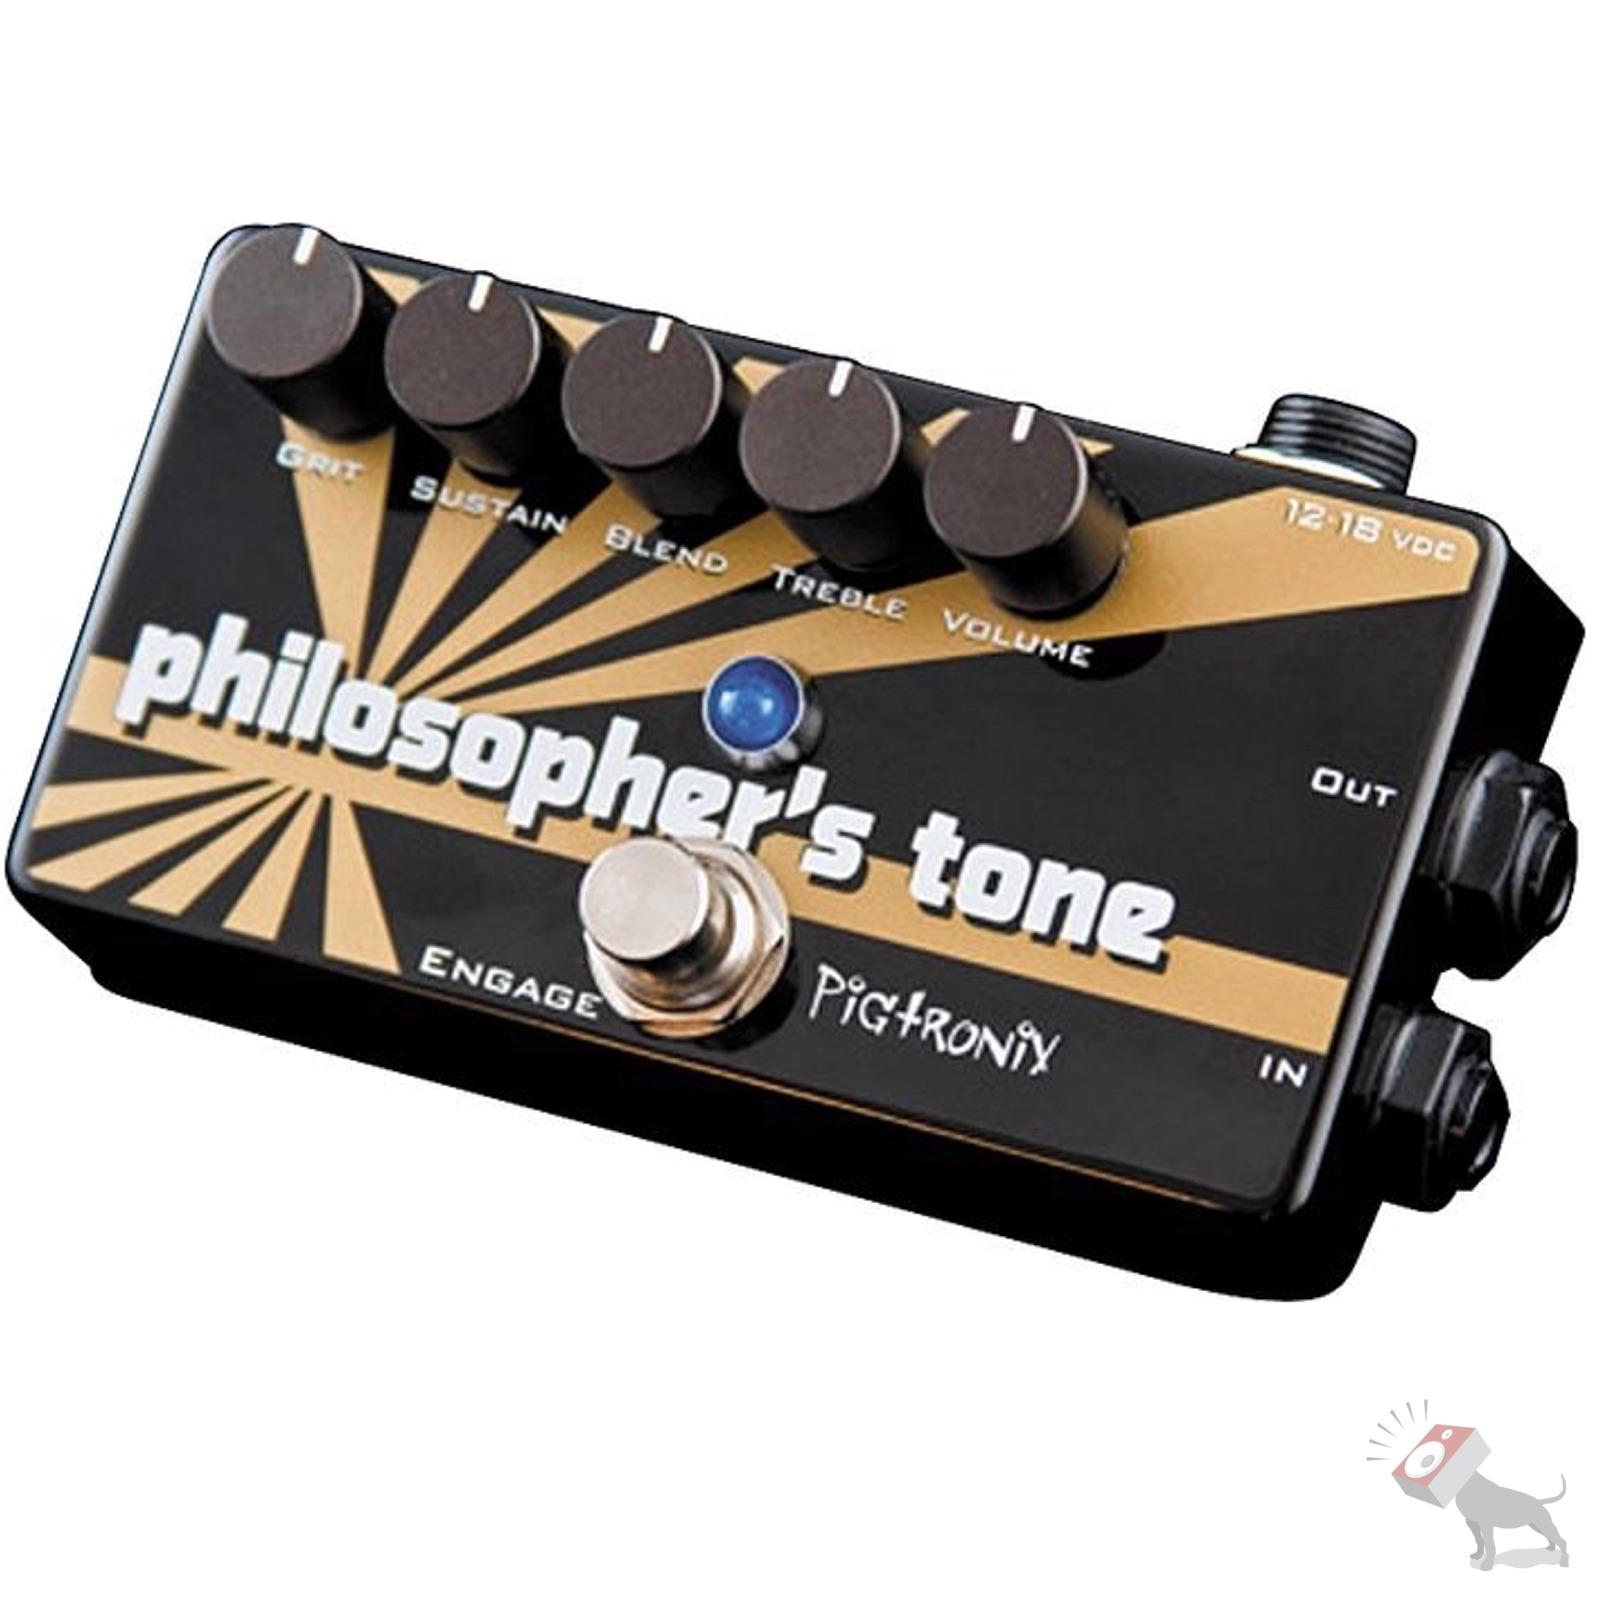 pigtronix philosopher 39 s tone compressor sustain distortion guitar effects pedal ebay. Black Bedroom Furniture Sets. Home Design Ideas